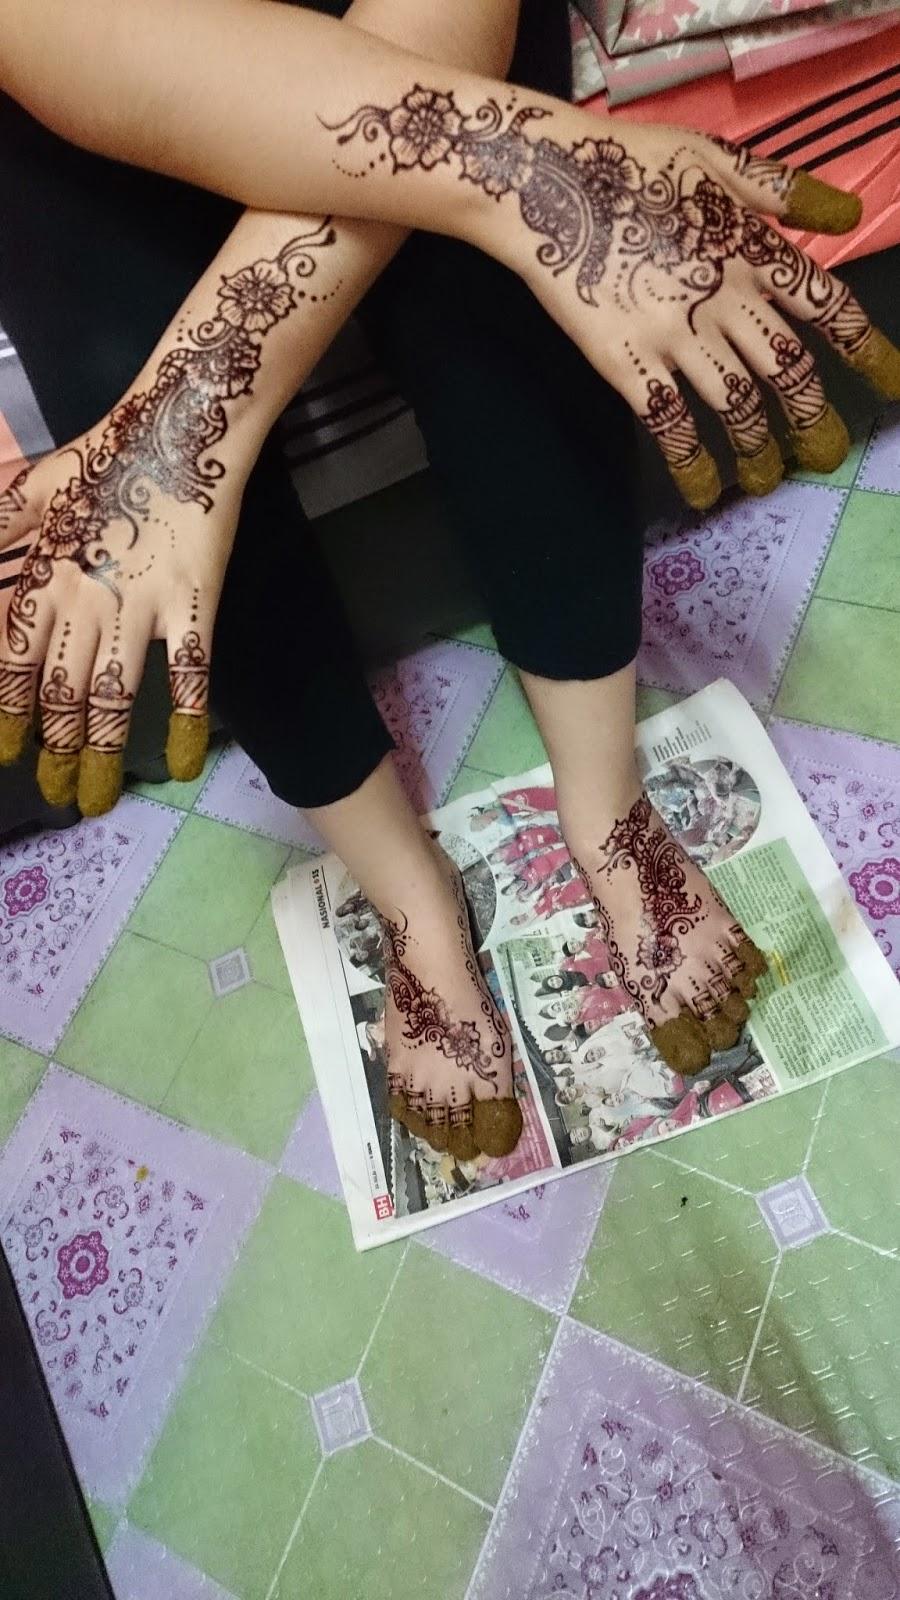 Ikha Henna Artist Inai Tradisional VS Moden April 2015